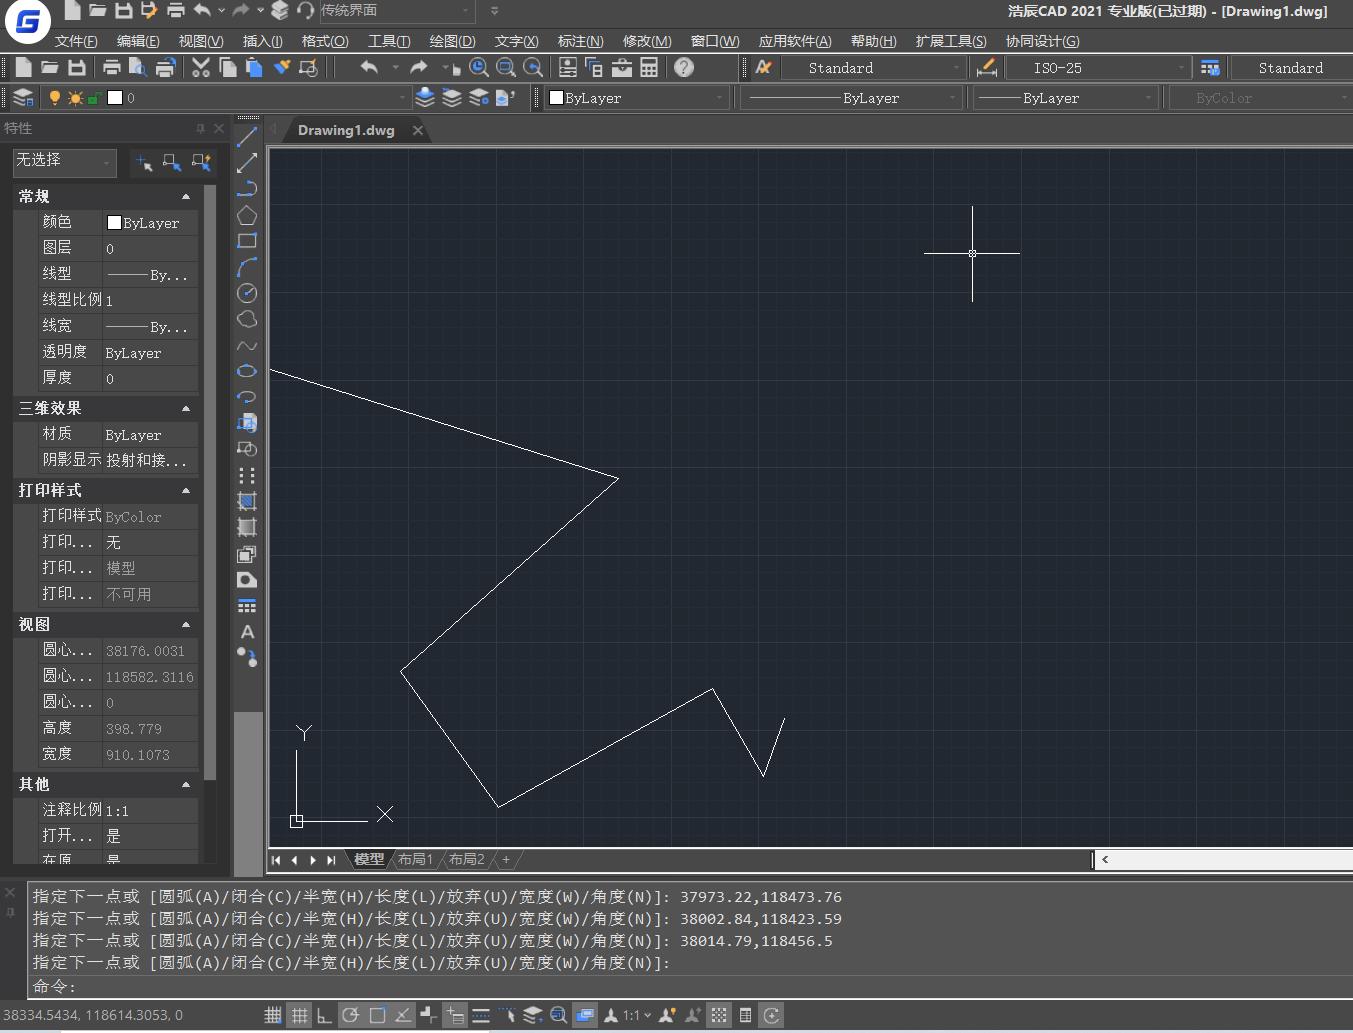 CAD中怎么通过坐标值画直线或多段线?